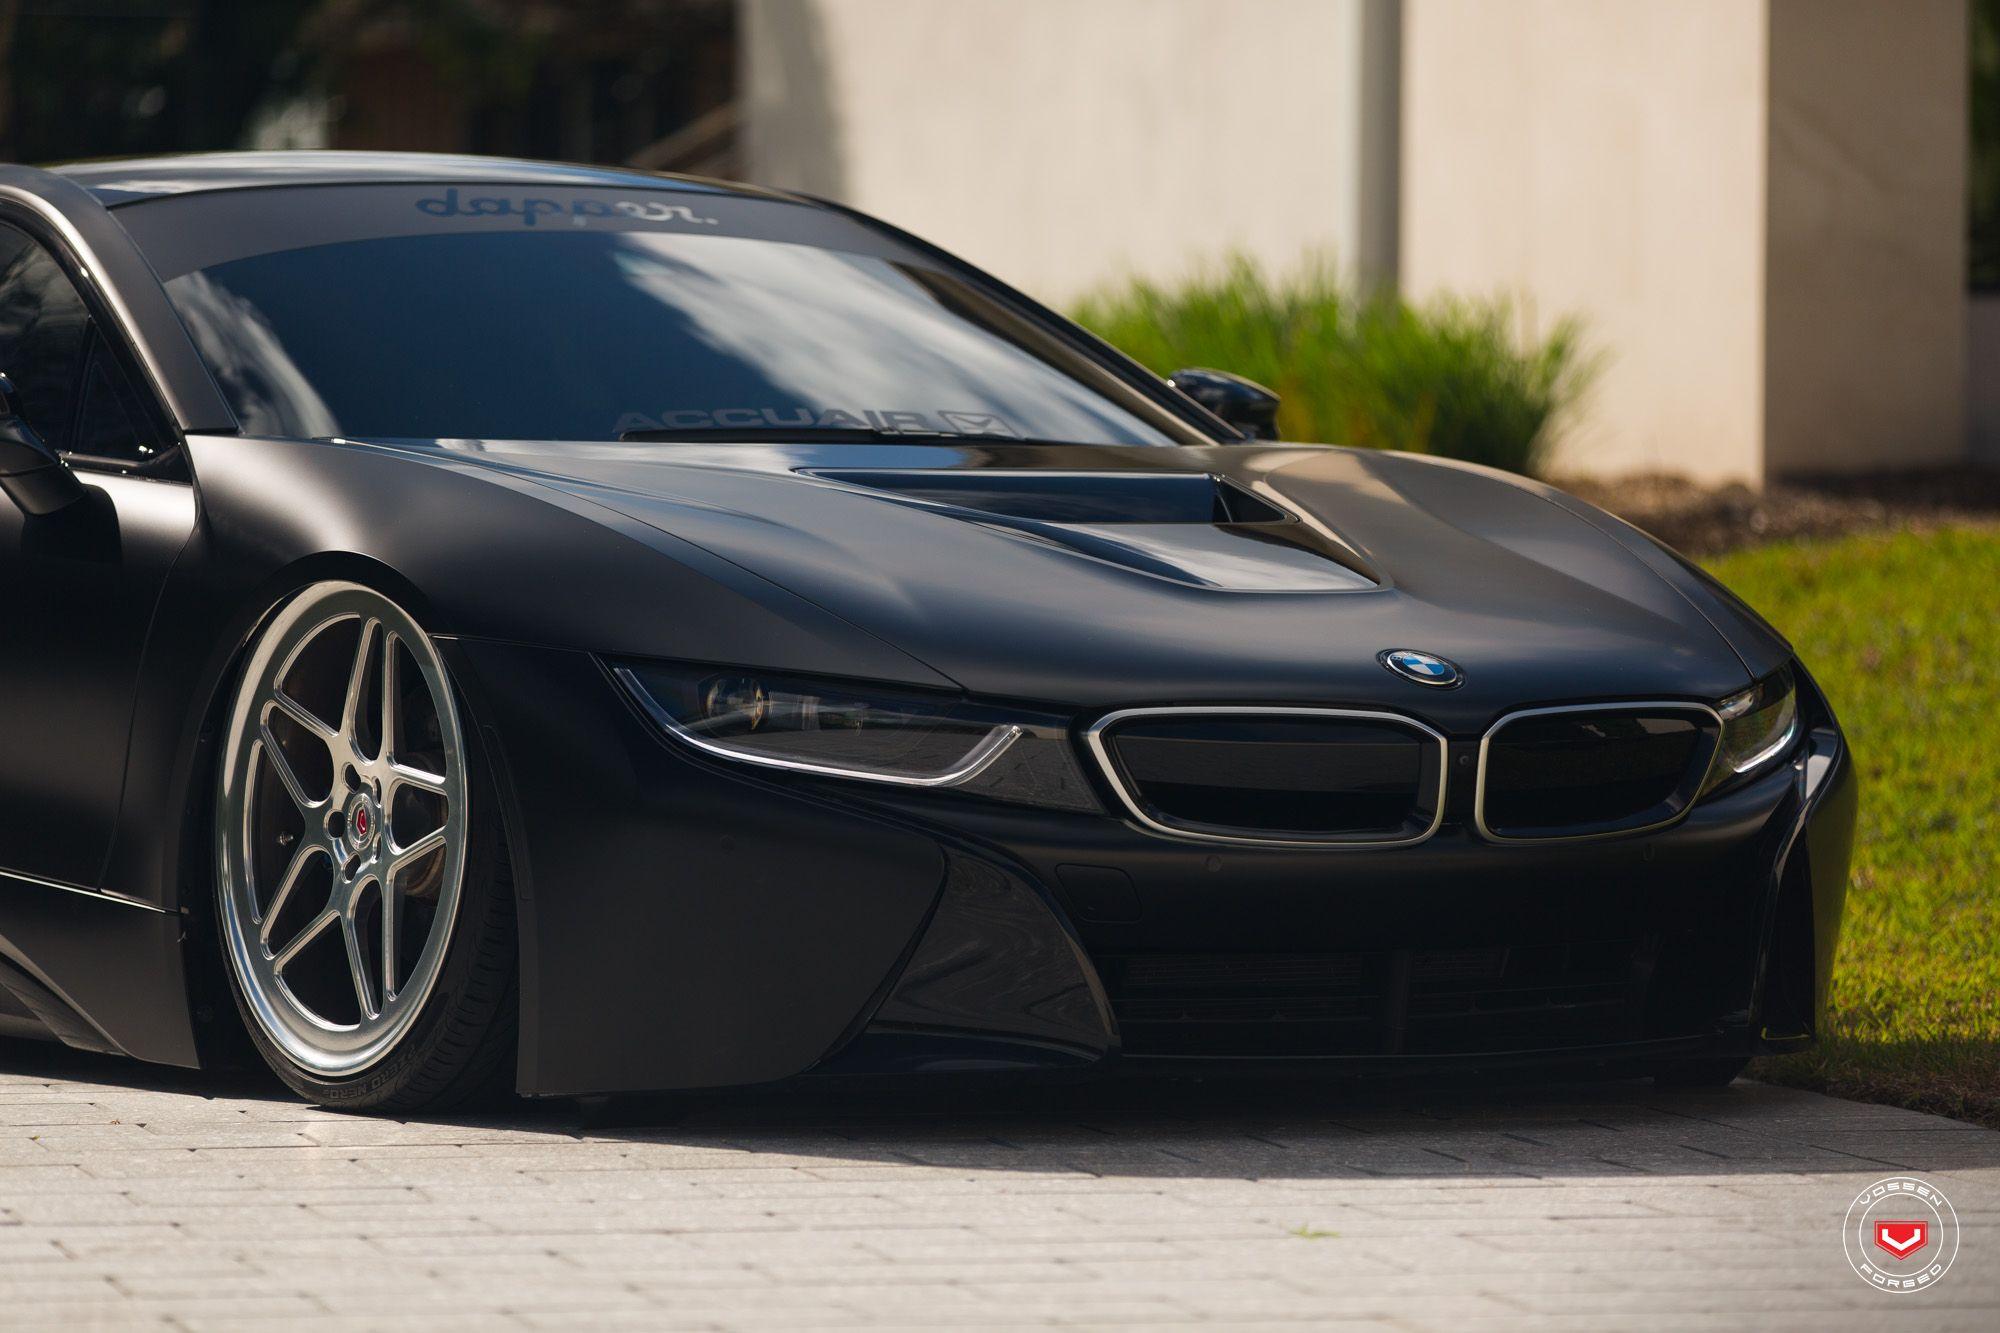 Bmw I8 Edrive Coupe Vossen Wheels Black Pearl Provocative